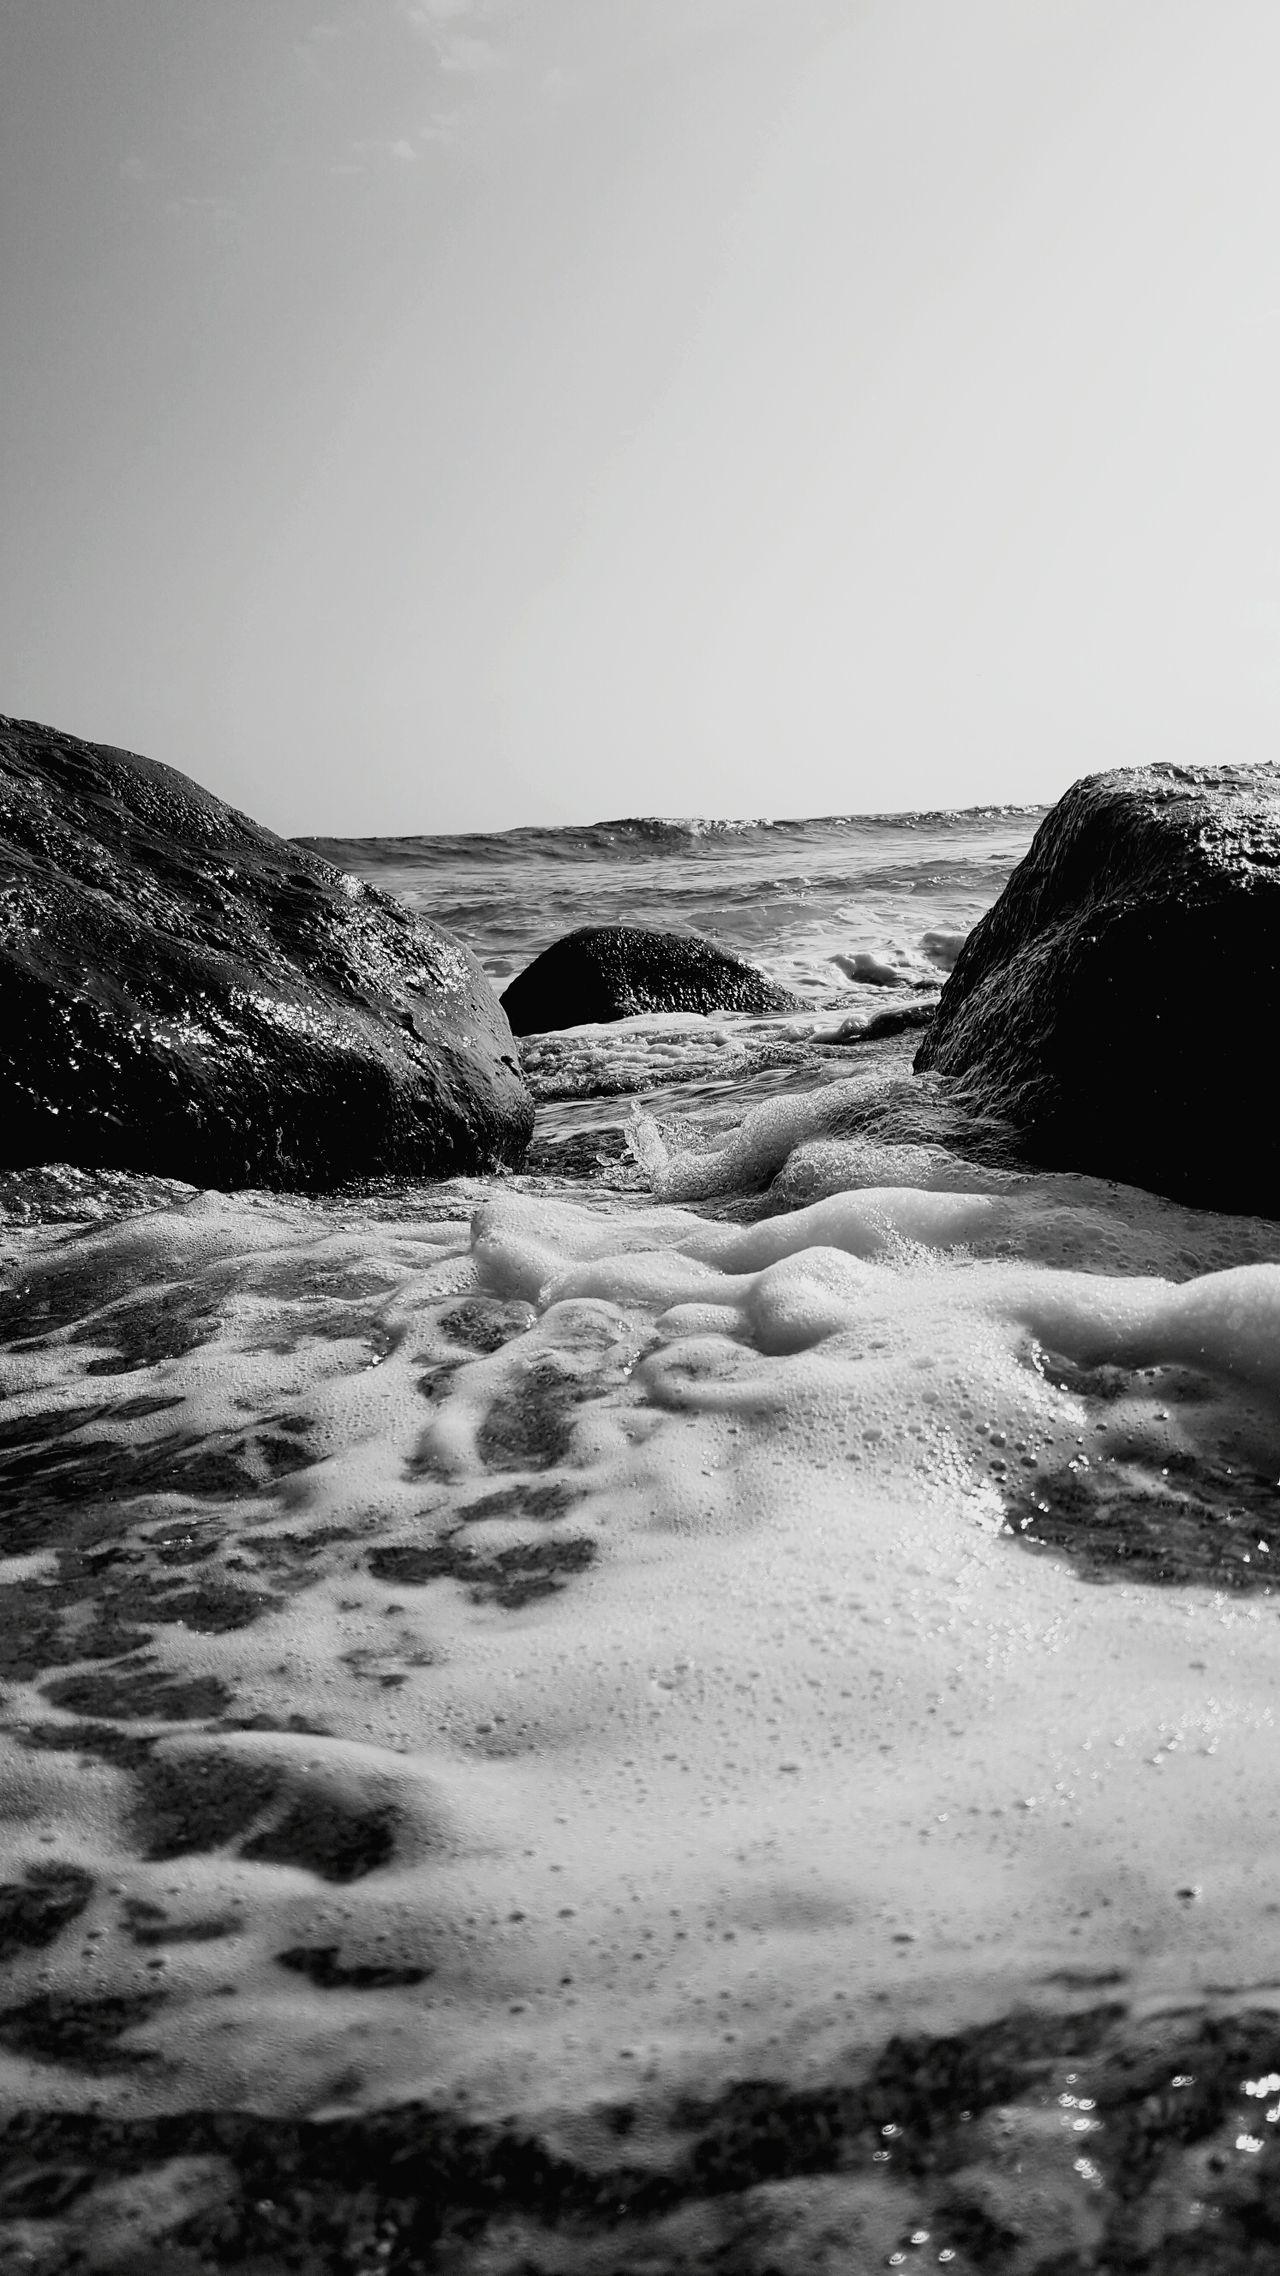 Sea Beach Wave Beauty In Nature Kauai Life Lydgate Beach Beach Photogrqphy Wet Rocks In Water Blackandwhite Photography